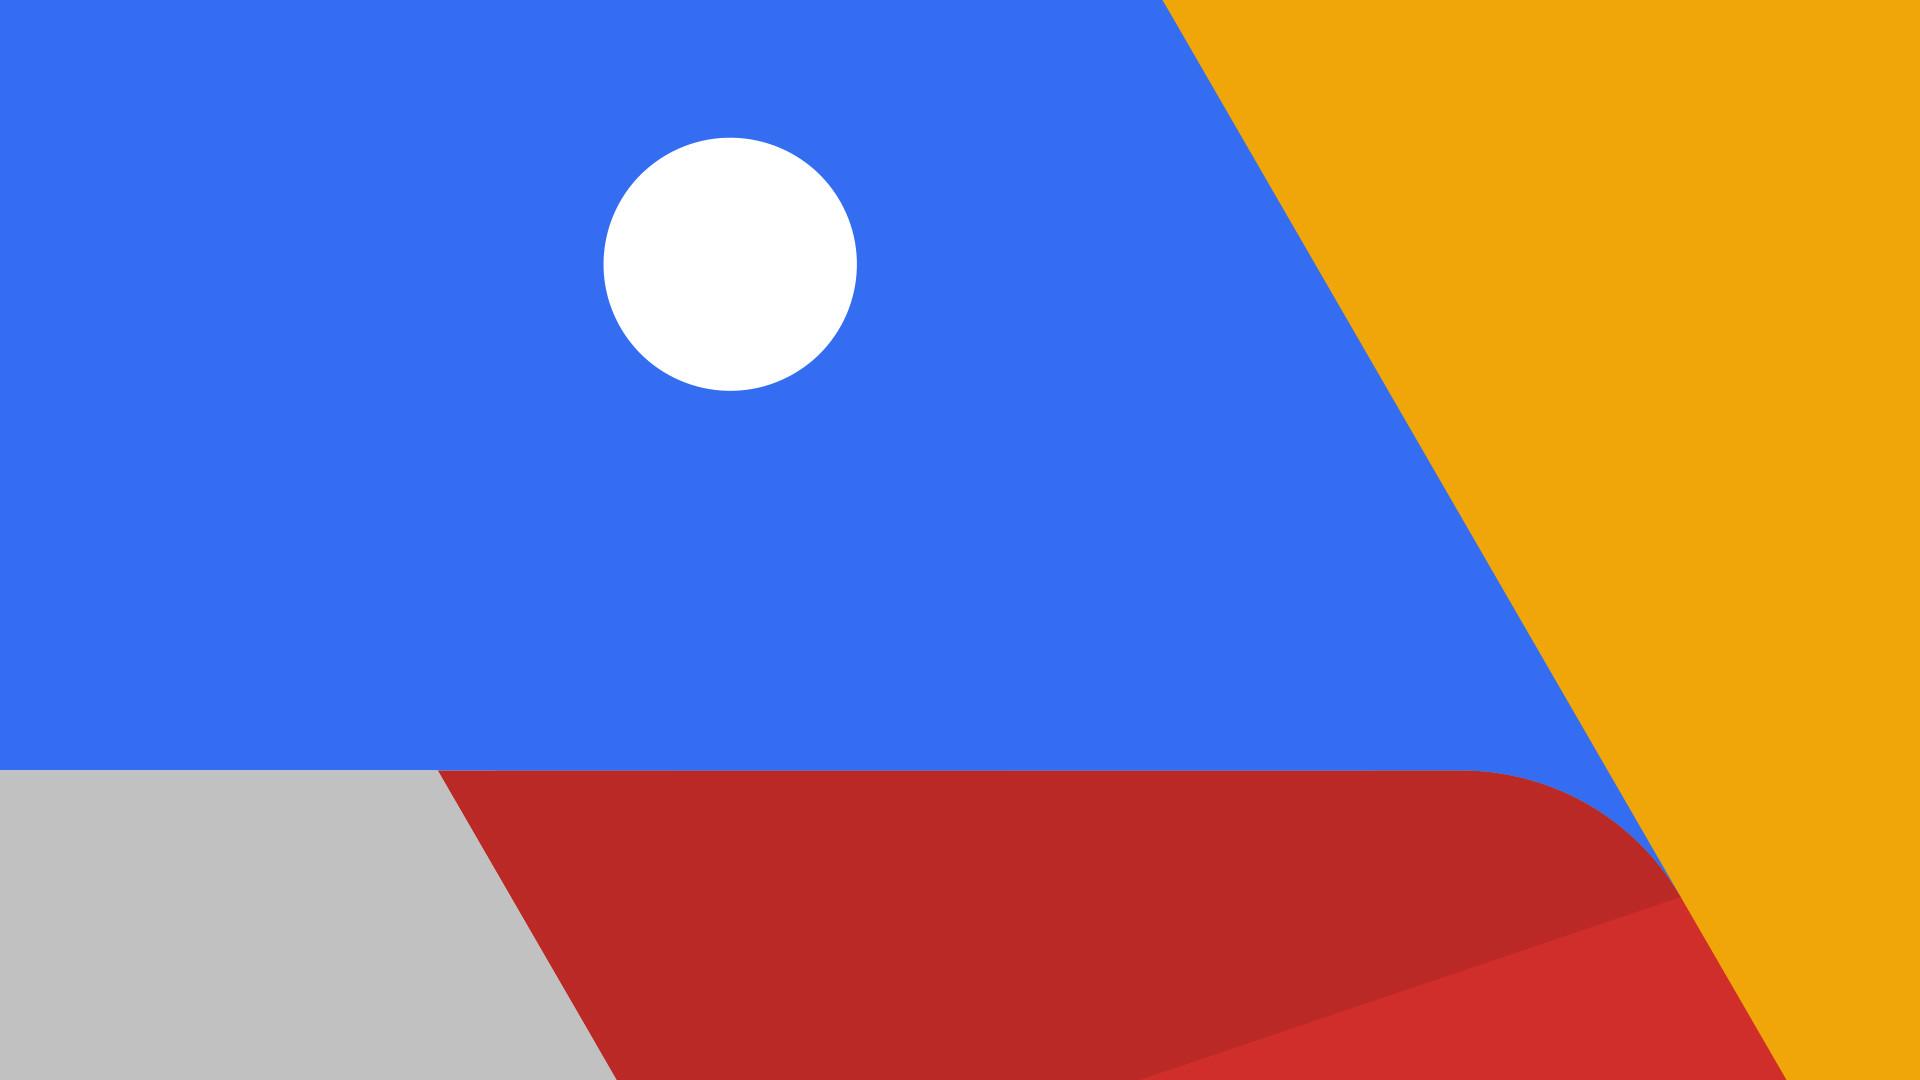 Google Desktop Backgrounds 59 Pictures